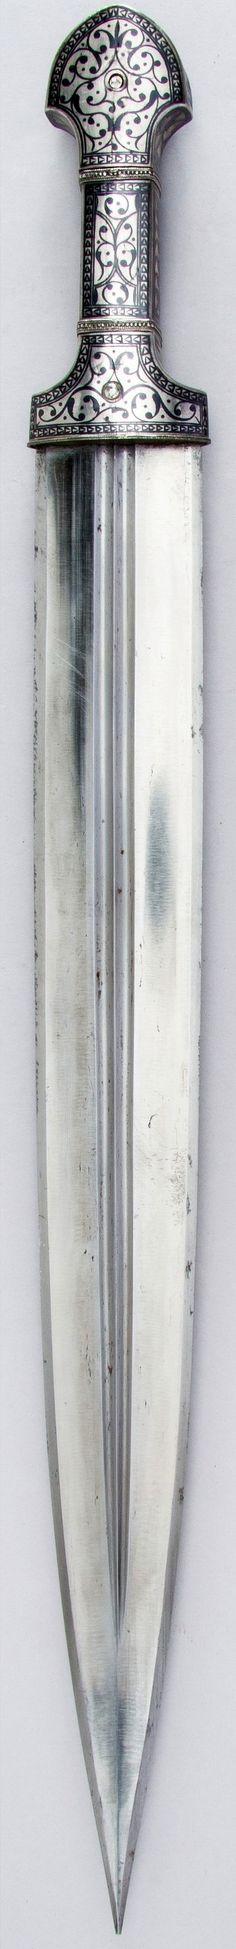 Caucasian (possibly northern Dagestan) qama dagger, ca. 1840–50, steel, wood, silver, niello, Met Museum.